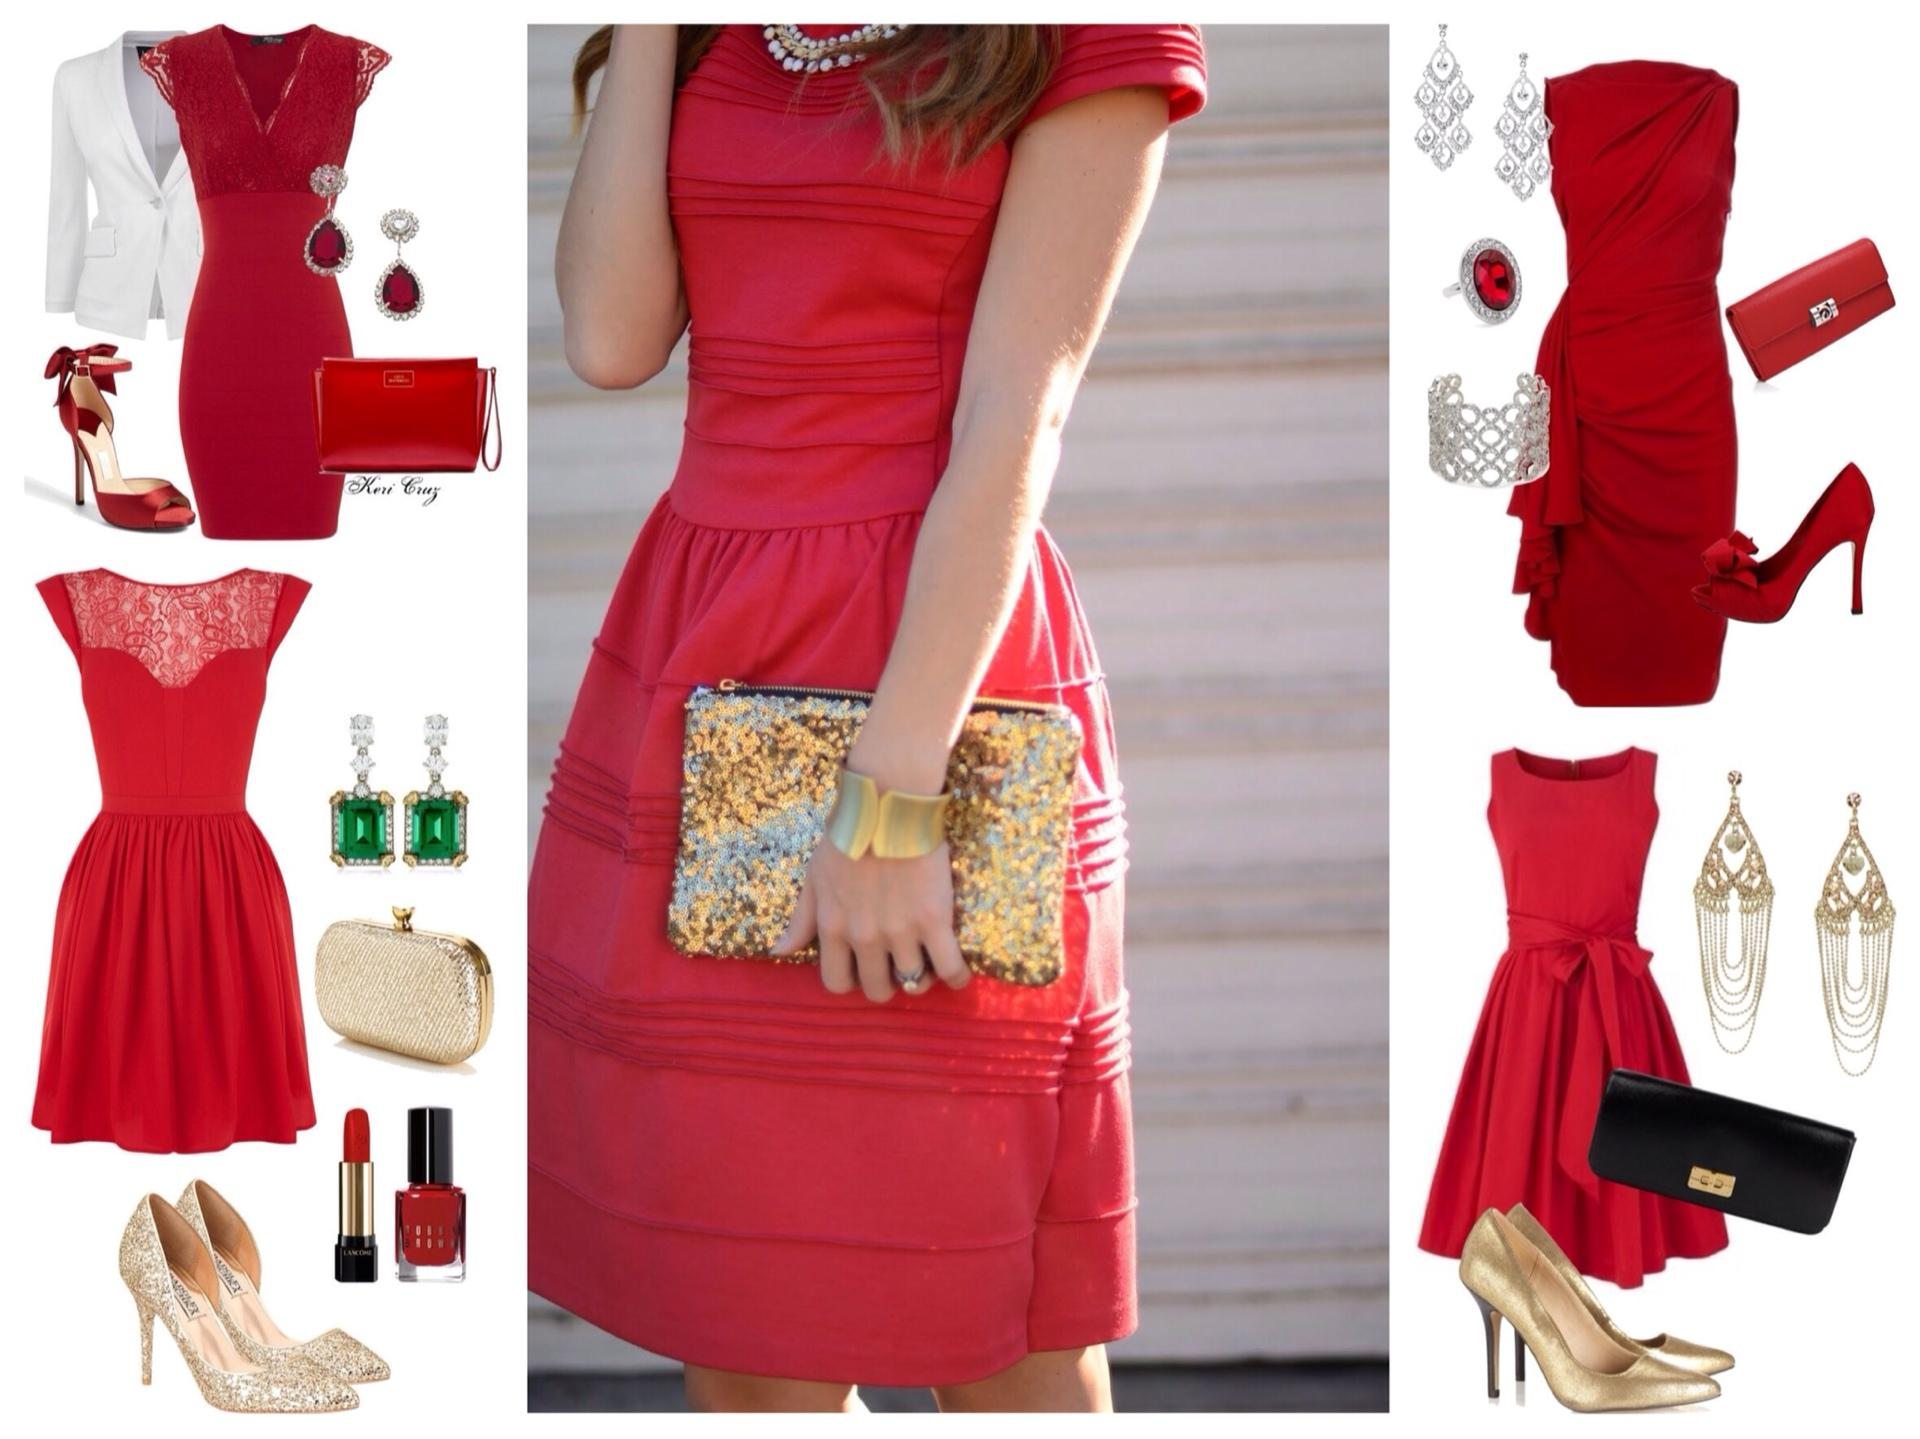 422e856e66f Выбор аксессуаров под красное платье